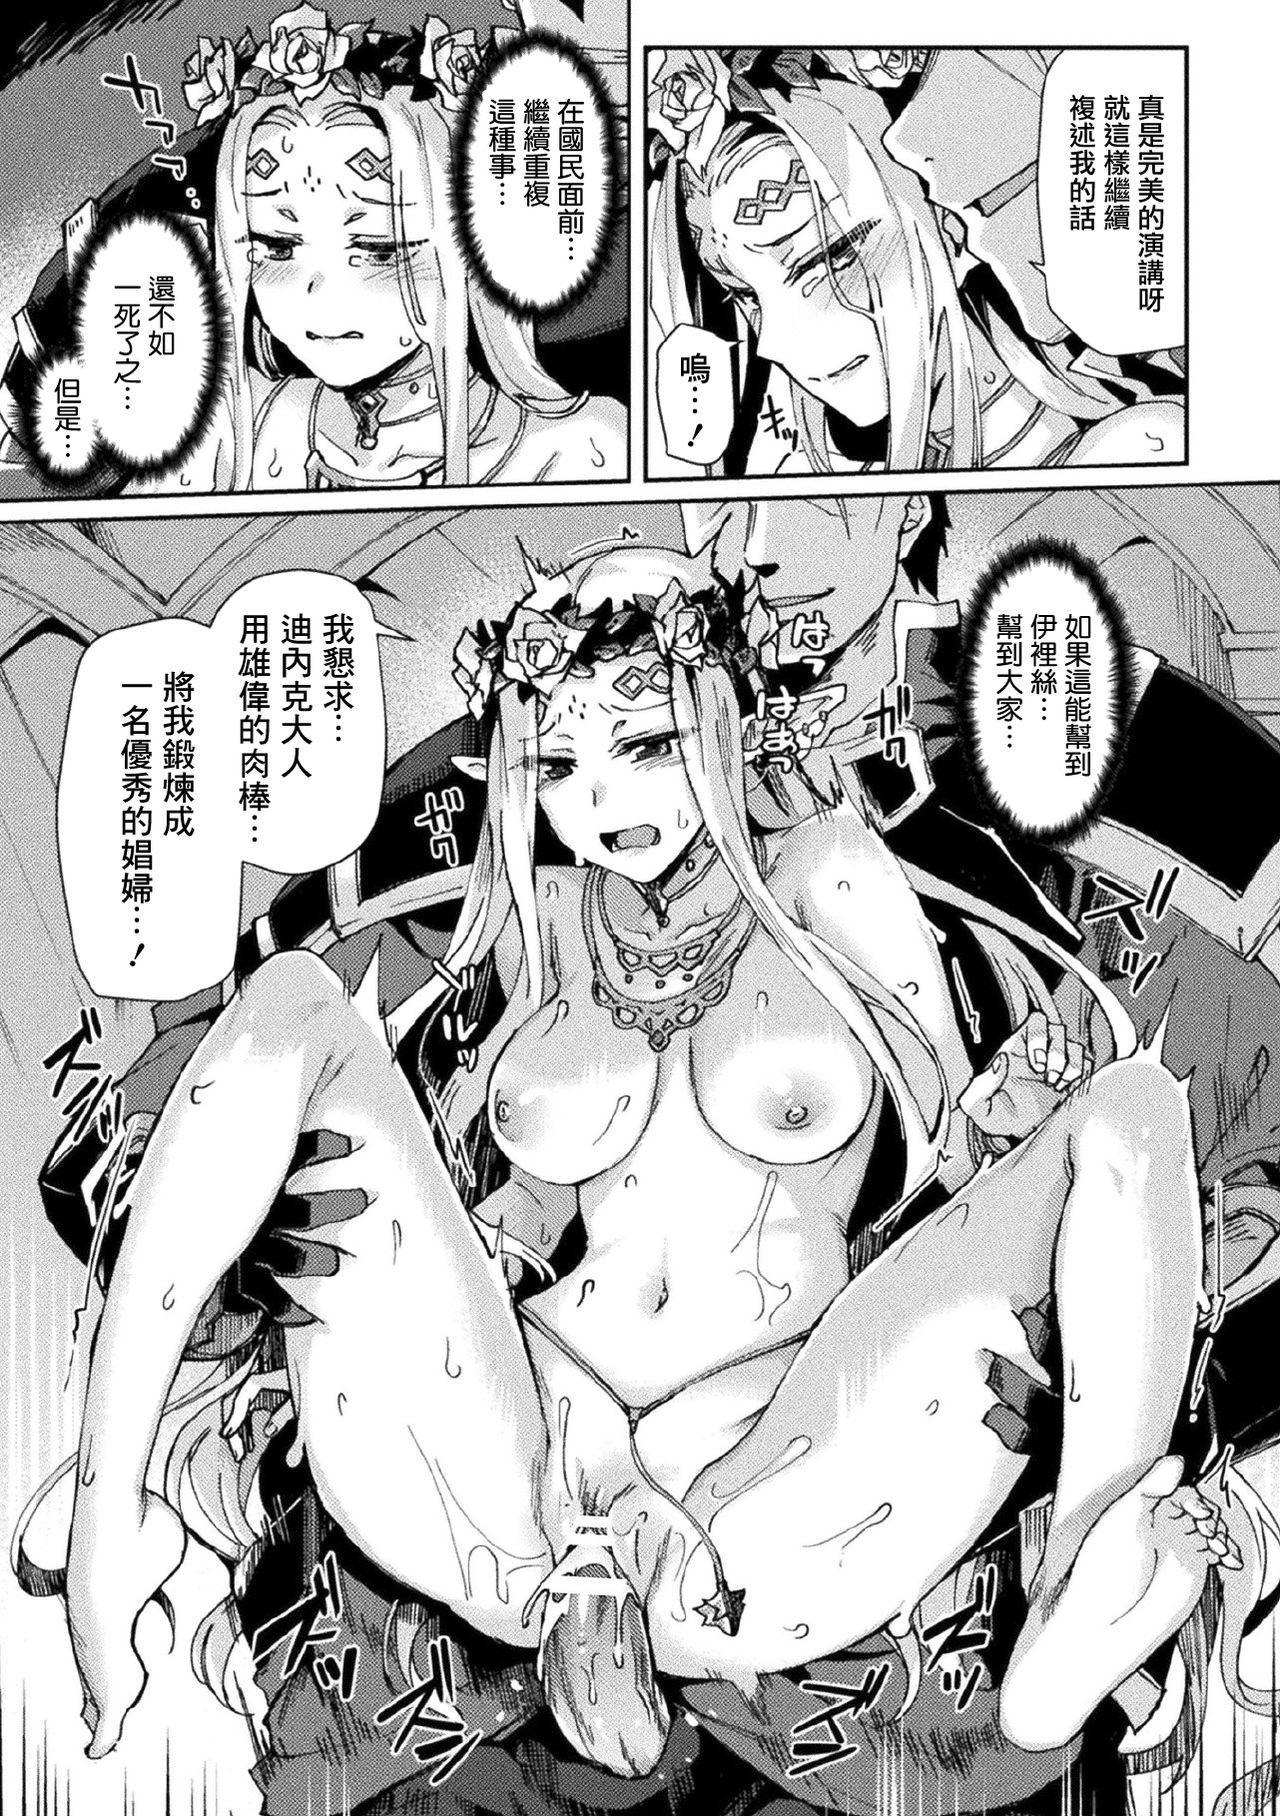 [Tsukitokage] Kuroinu II ~Inyoku ni Somaru Haitoku no Miyako, Futatabi~ THE COMIC Chapter 8 (Kukkoro Heroines Vol. 11) [Digital] [Chinese] [鬼畜王漢化組] [Digital] 5